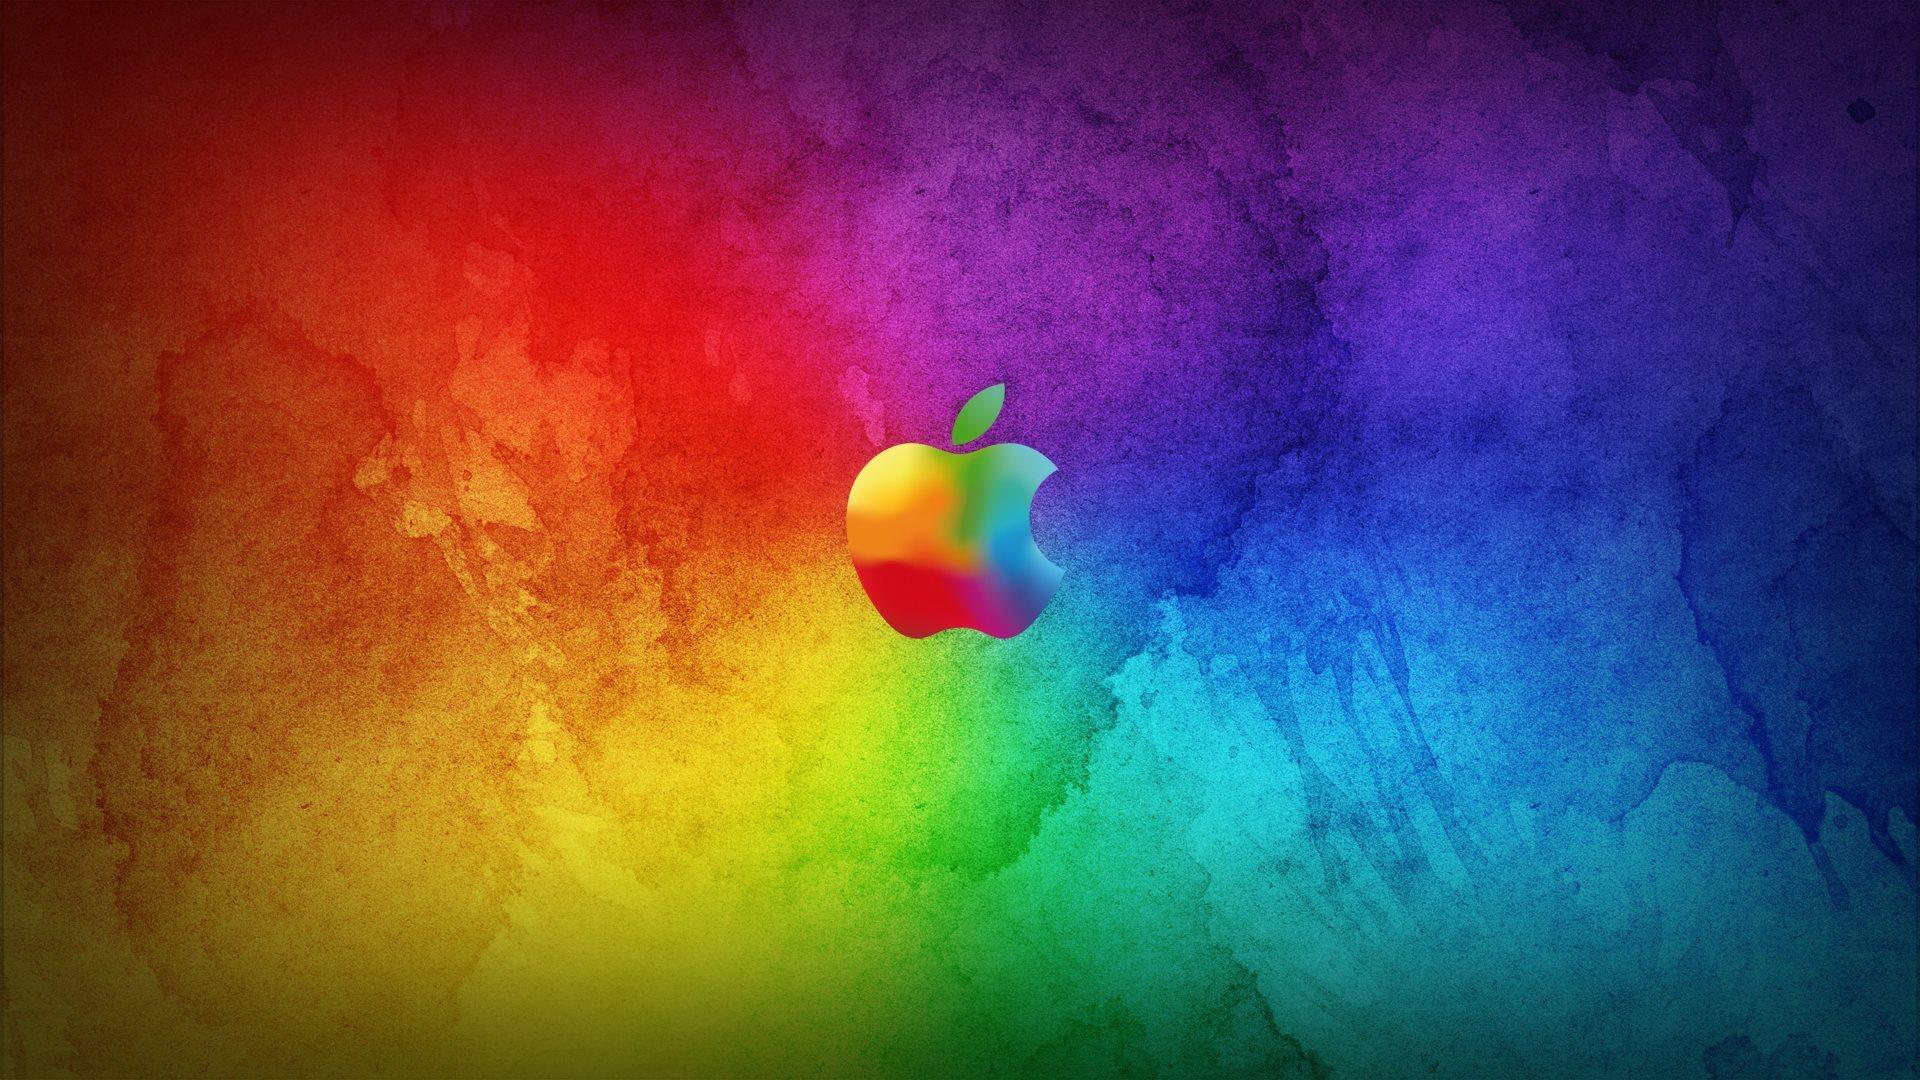 78] Apple Desktop Wallpapers on WallpaperSafari 1920x1080